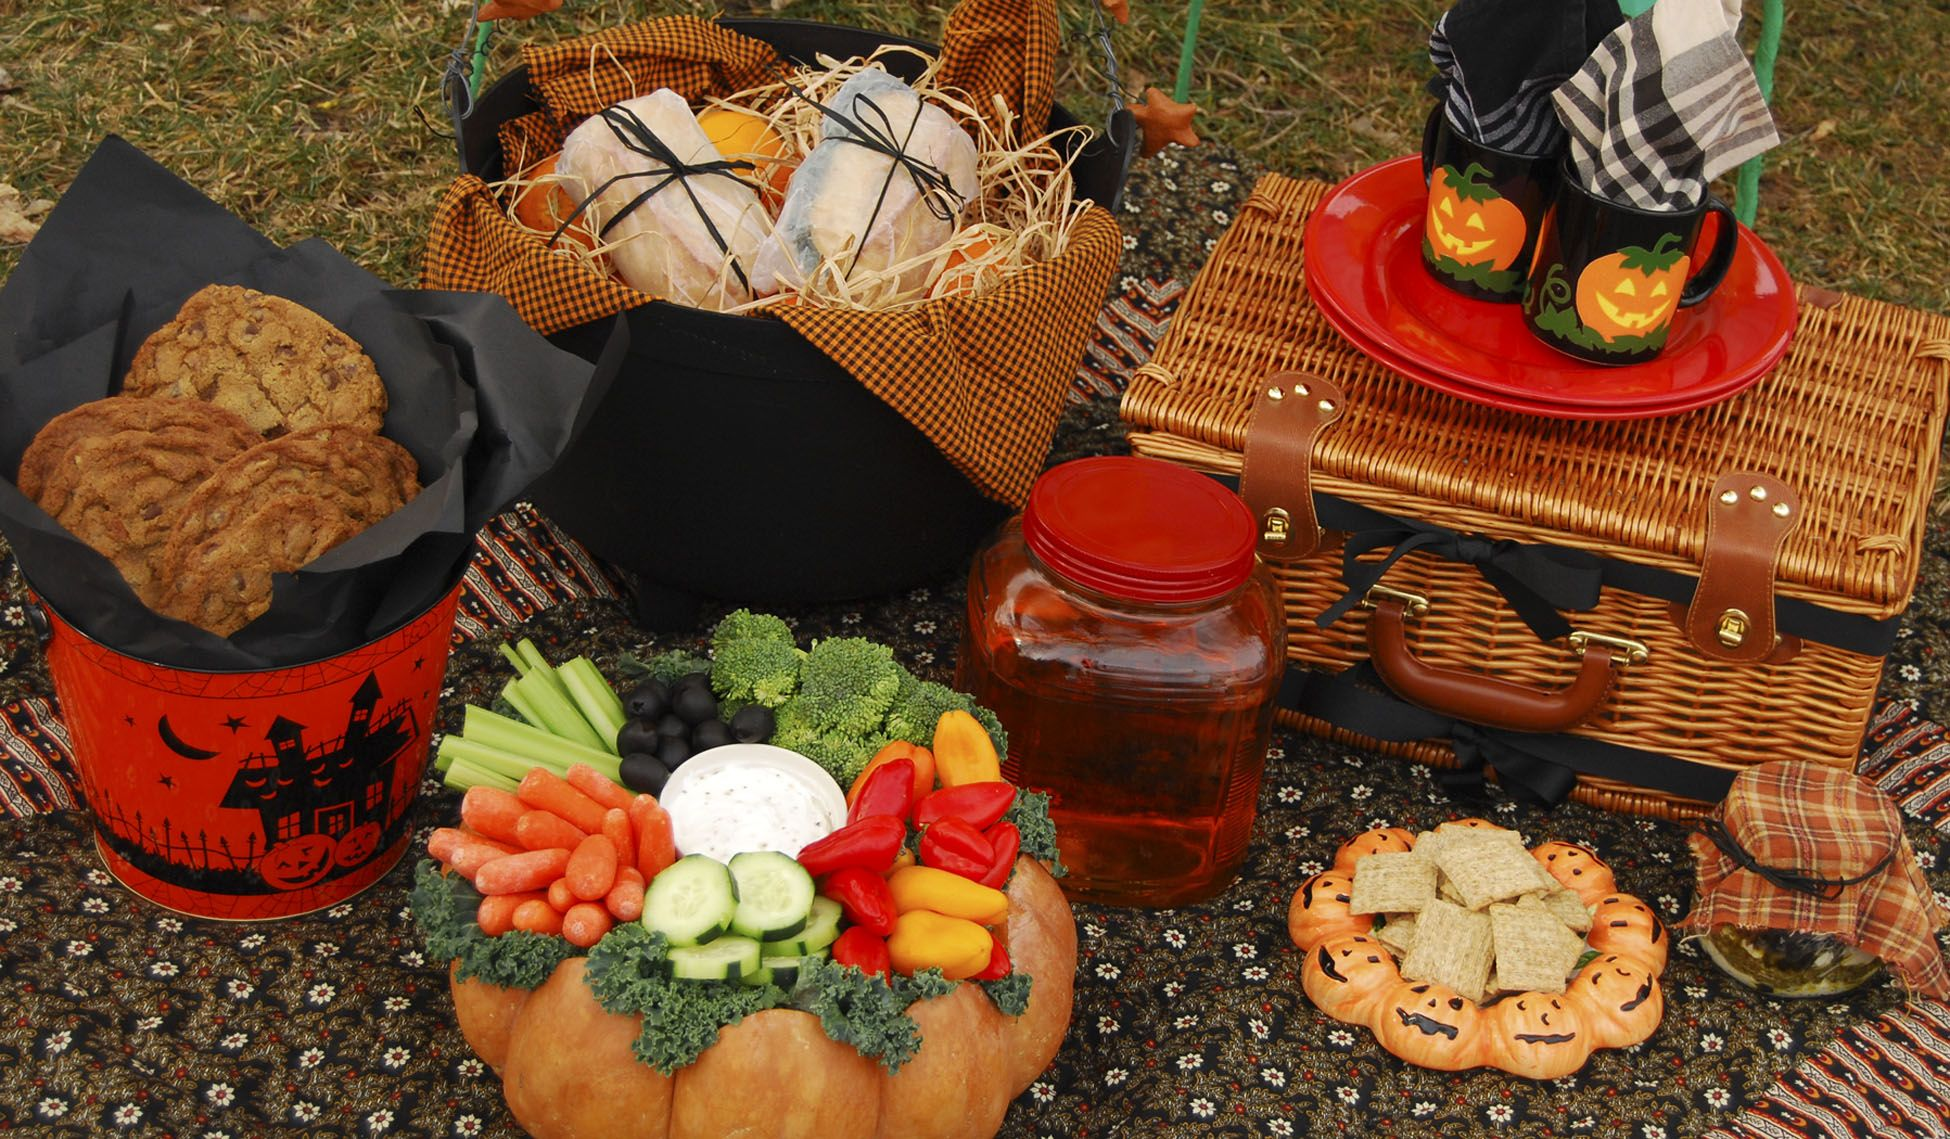 Romantic fall picnic ideas